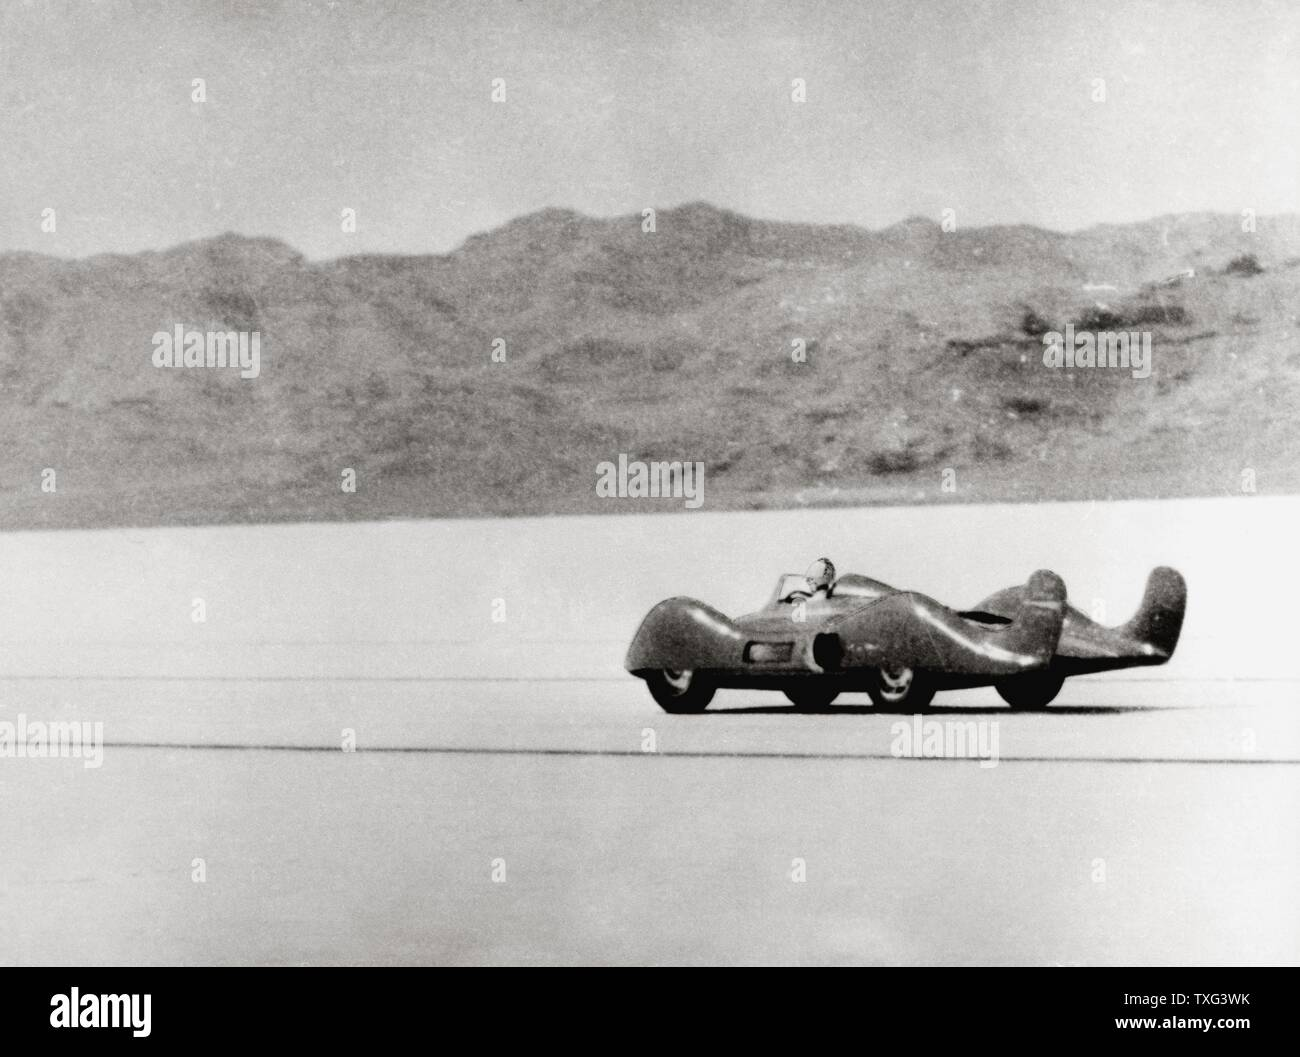 BRITISH PRE WAR SPEED RECORD GOLDEN-ARROW RACE CAR TIN AB